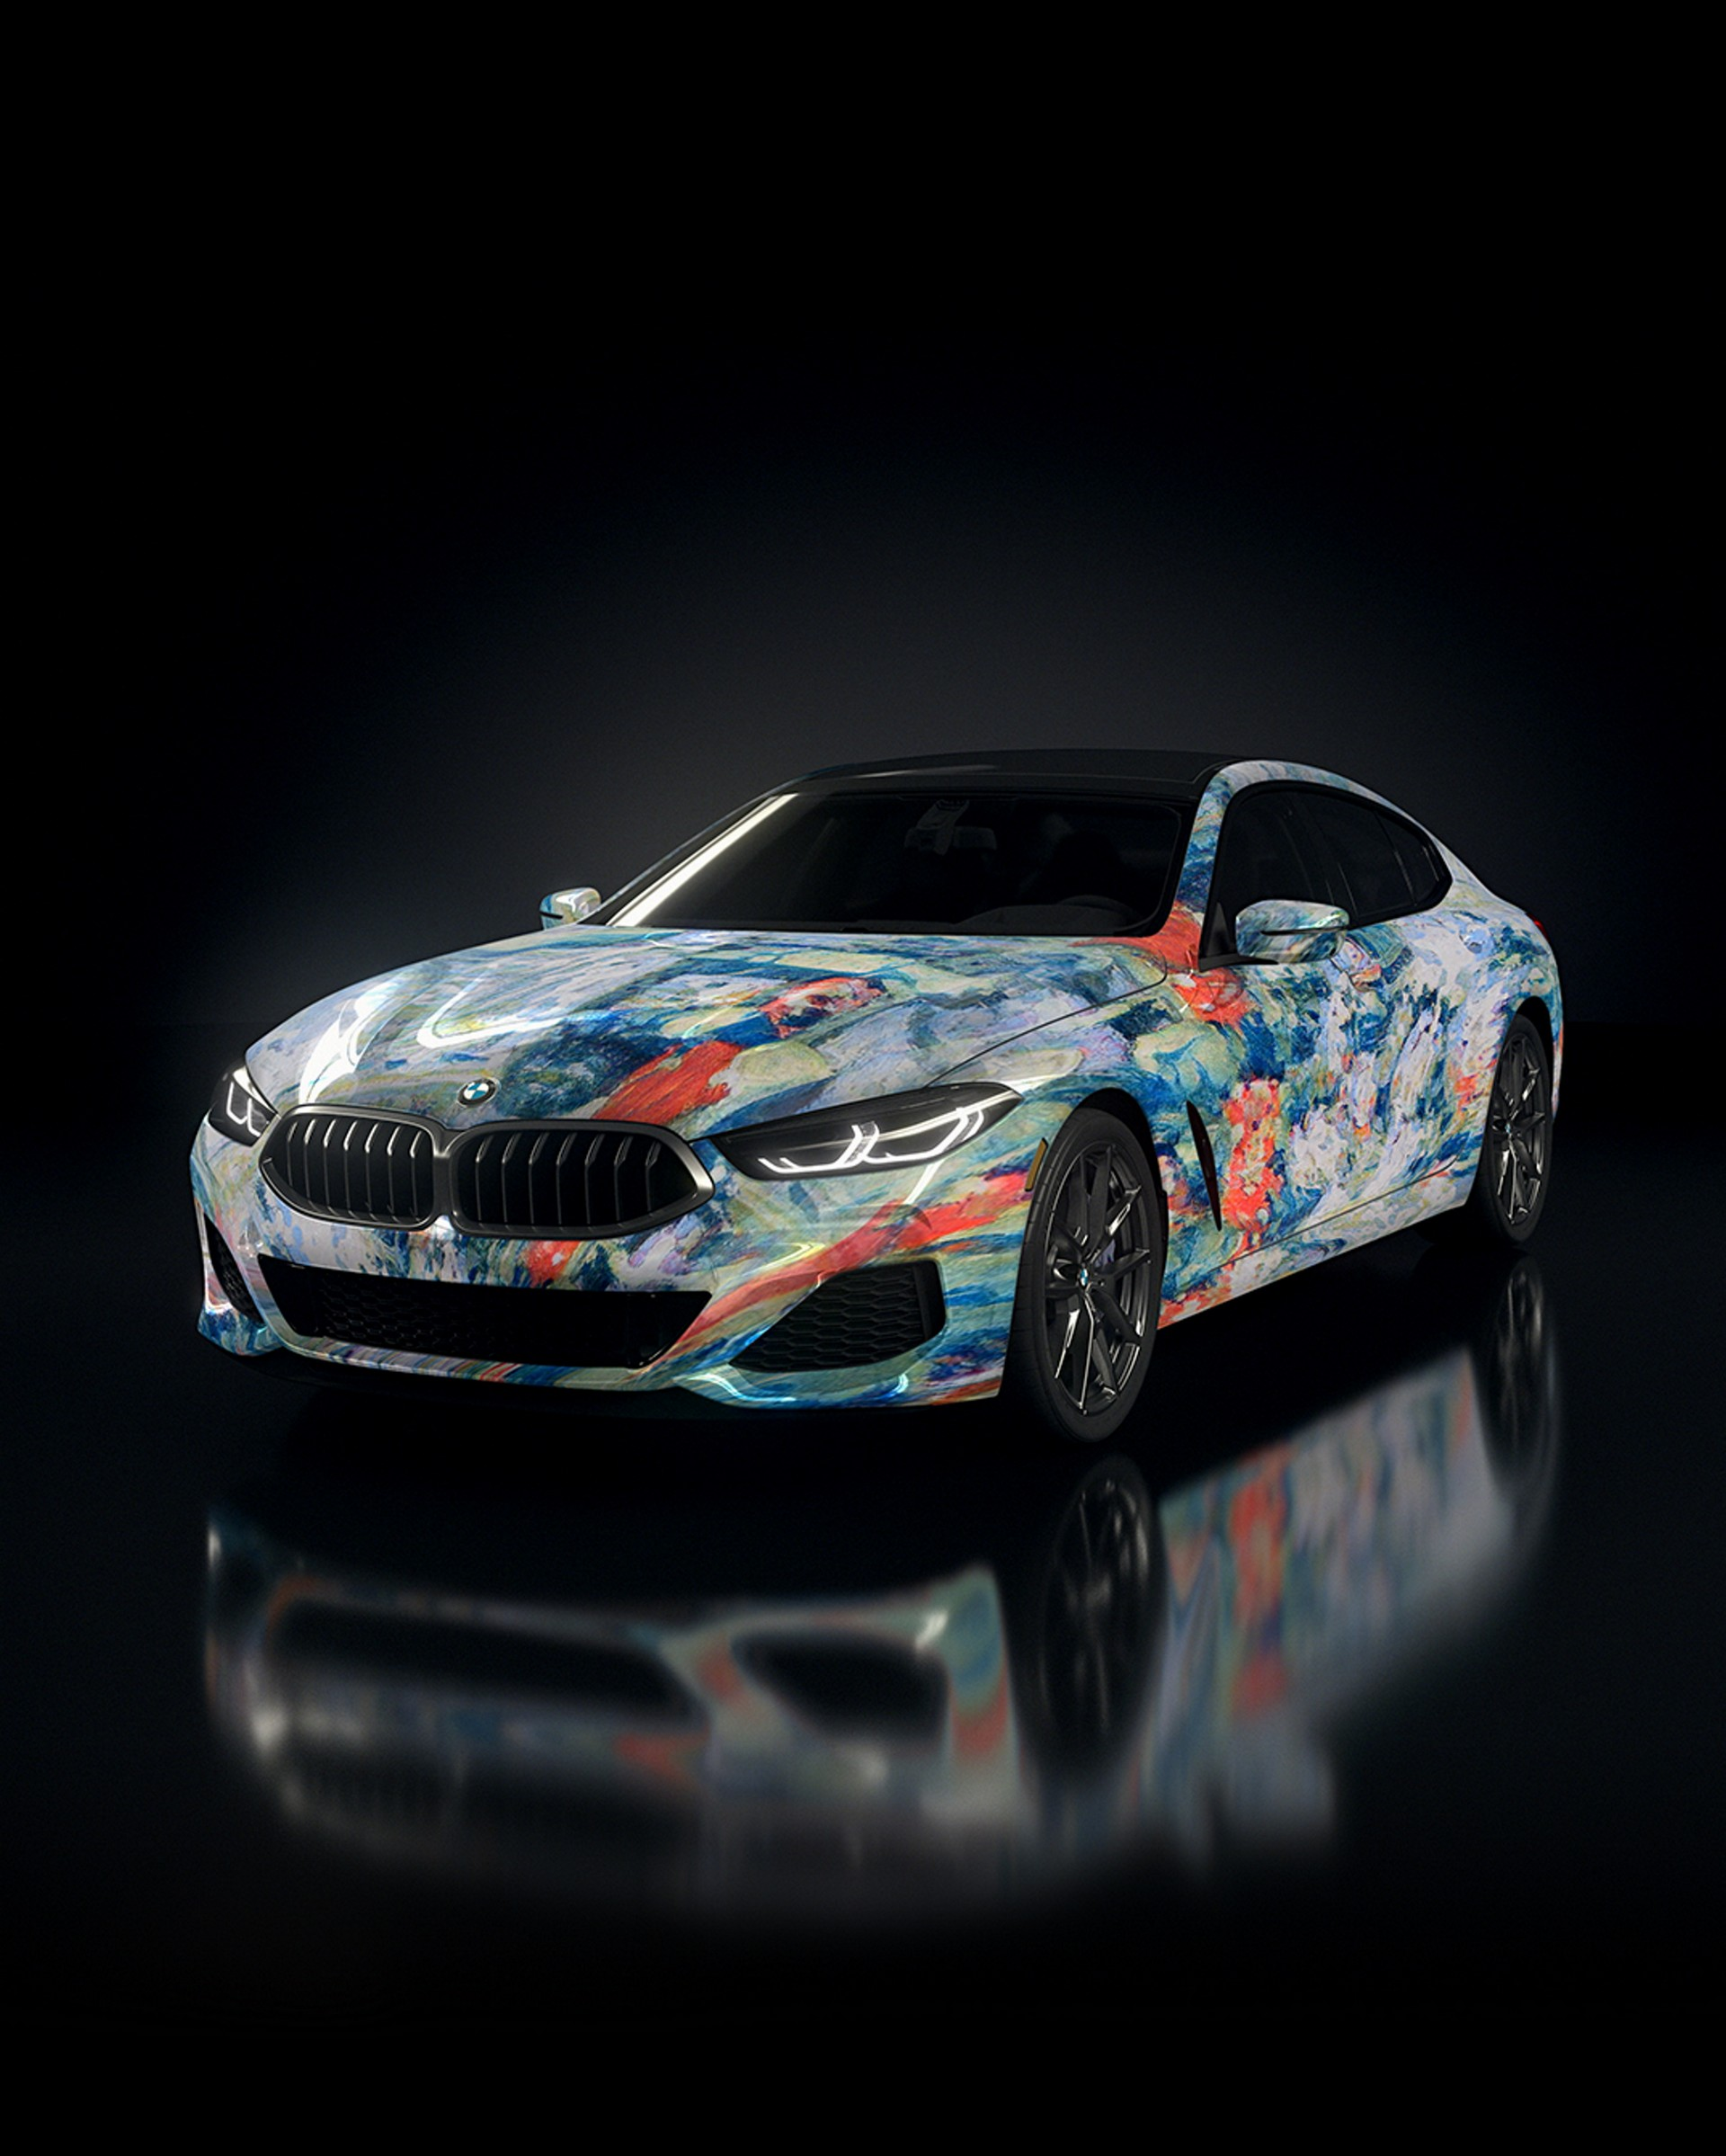 BMW-8-Series-Gran-Coupe-art-car-29